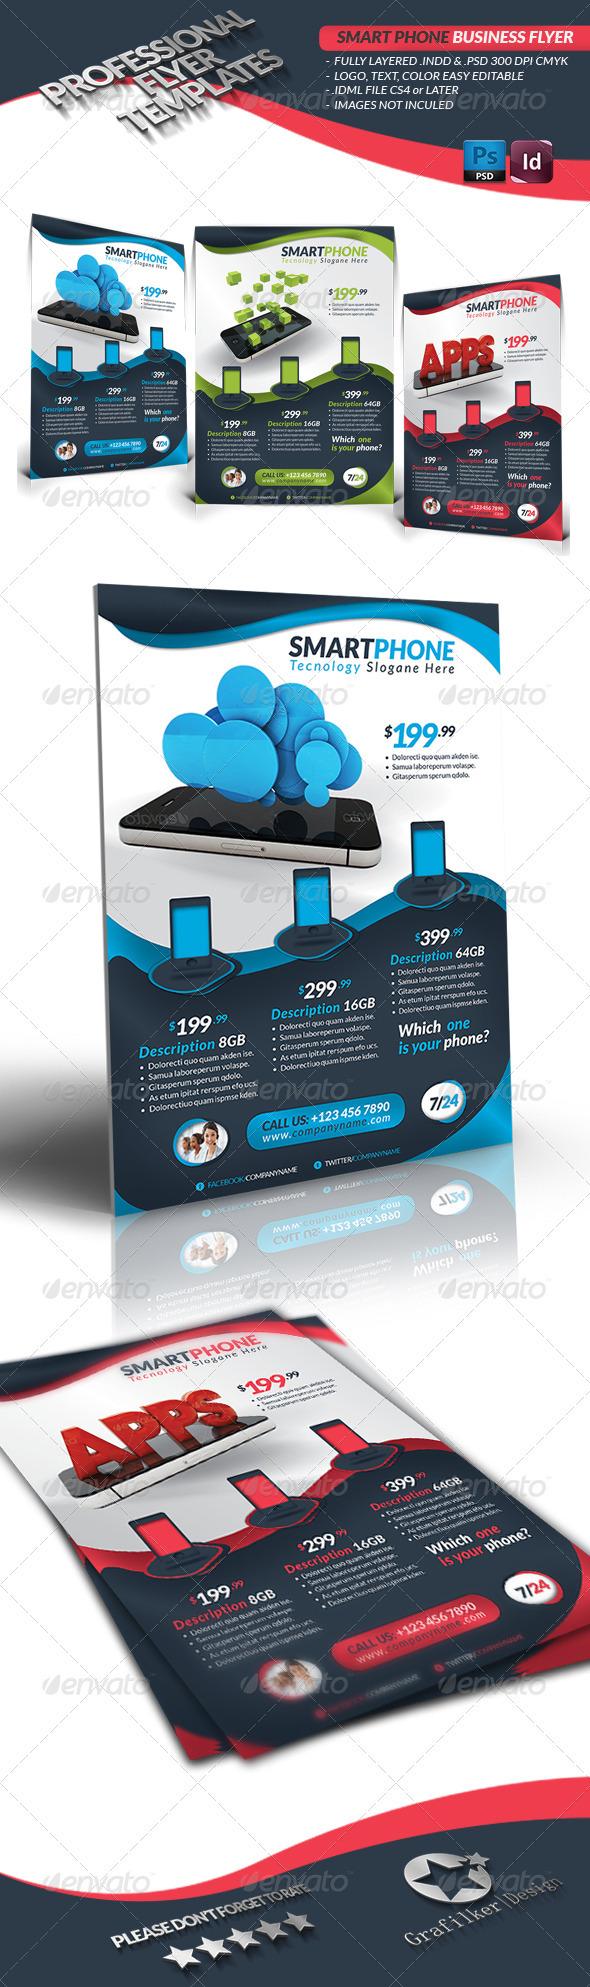 Smart Phone Business Flyer - Commerce Flyers